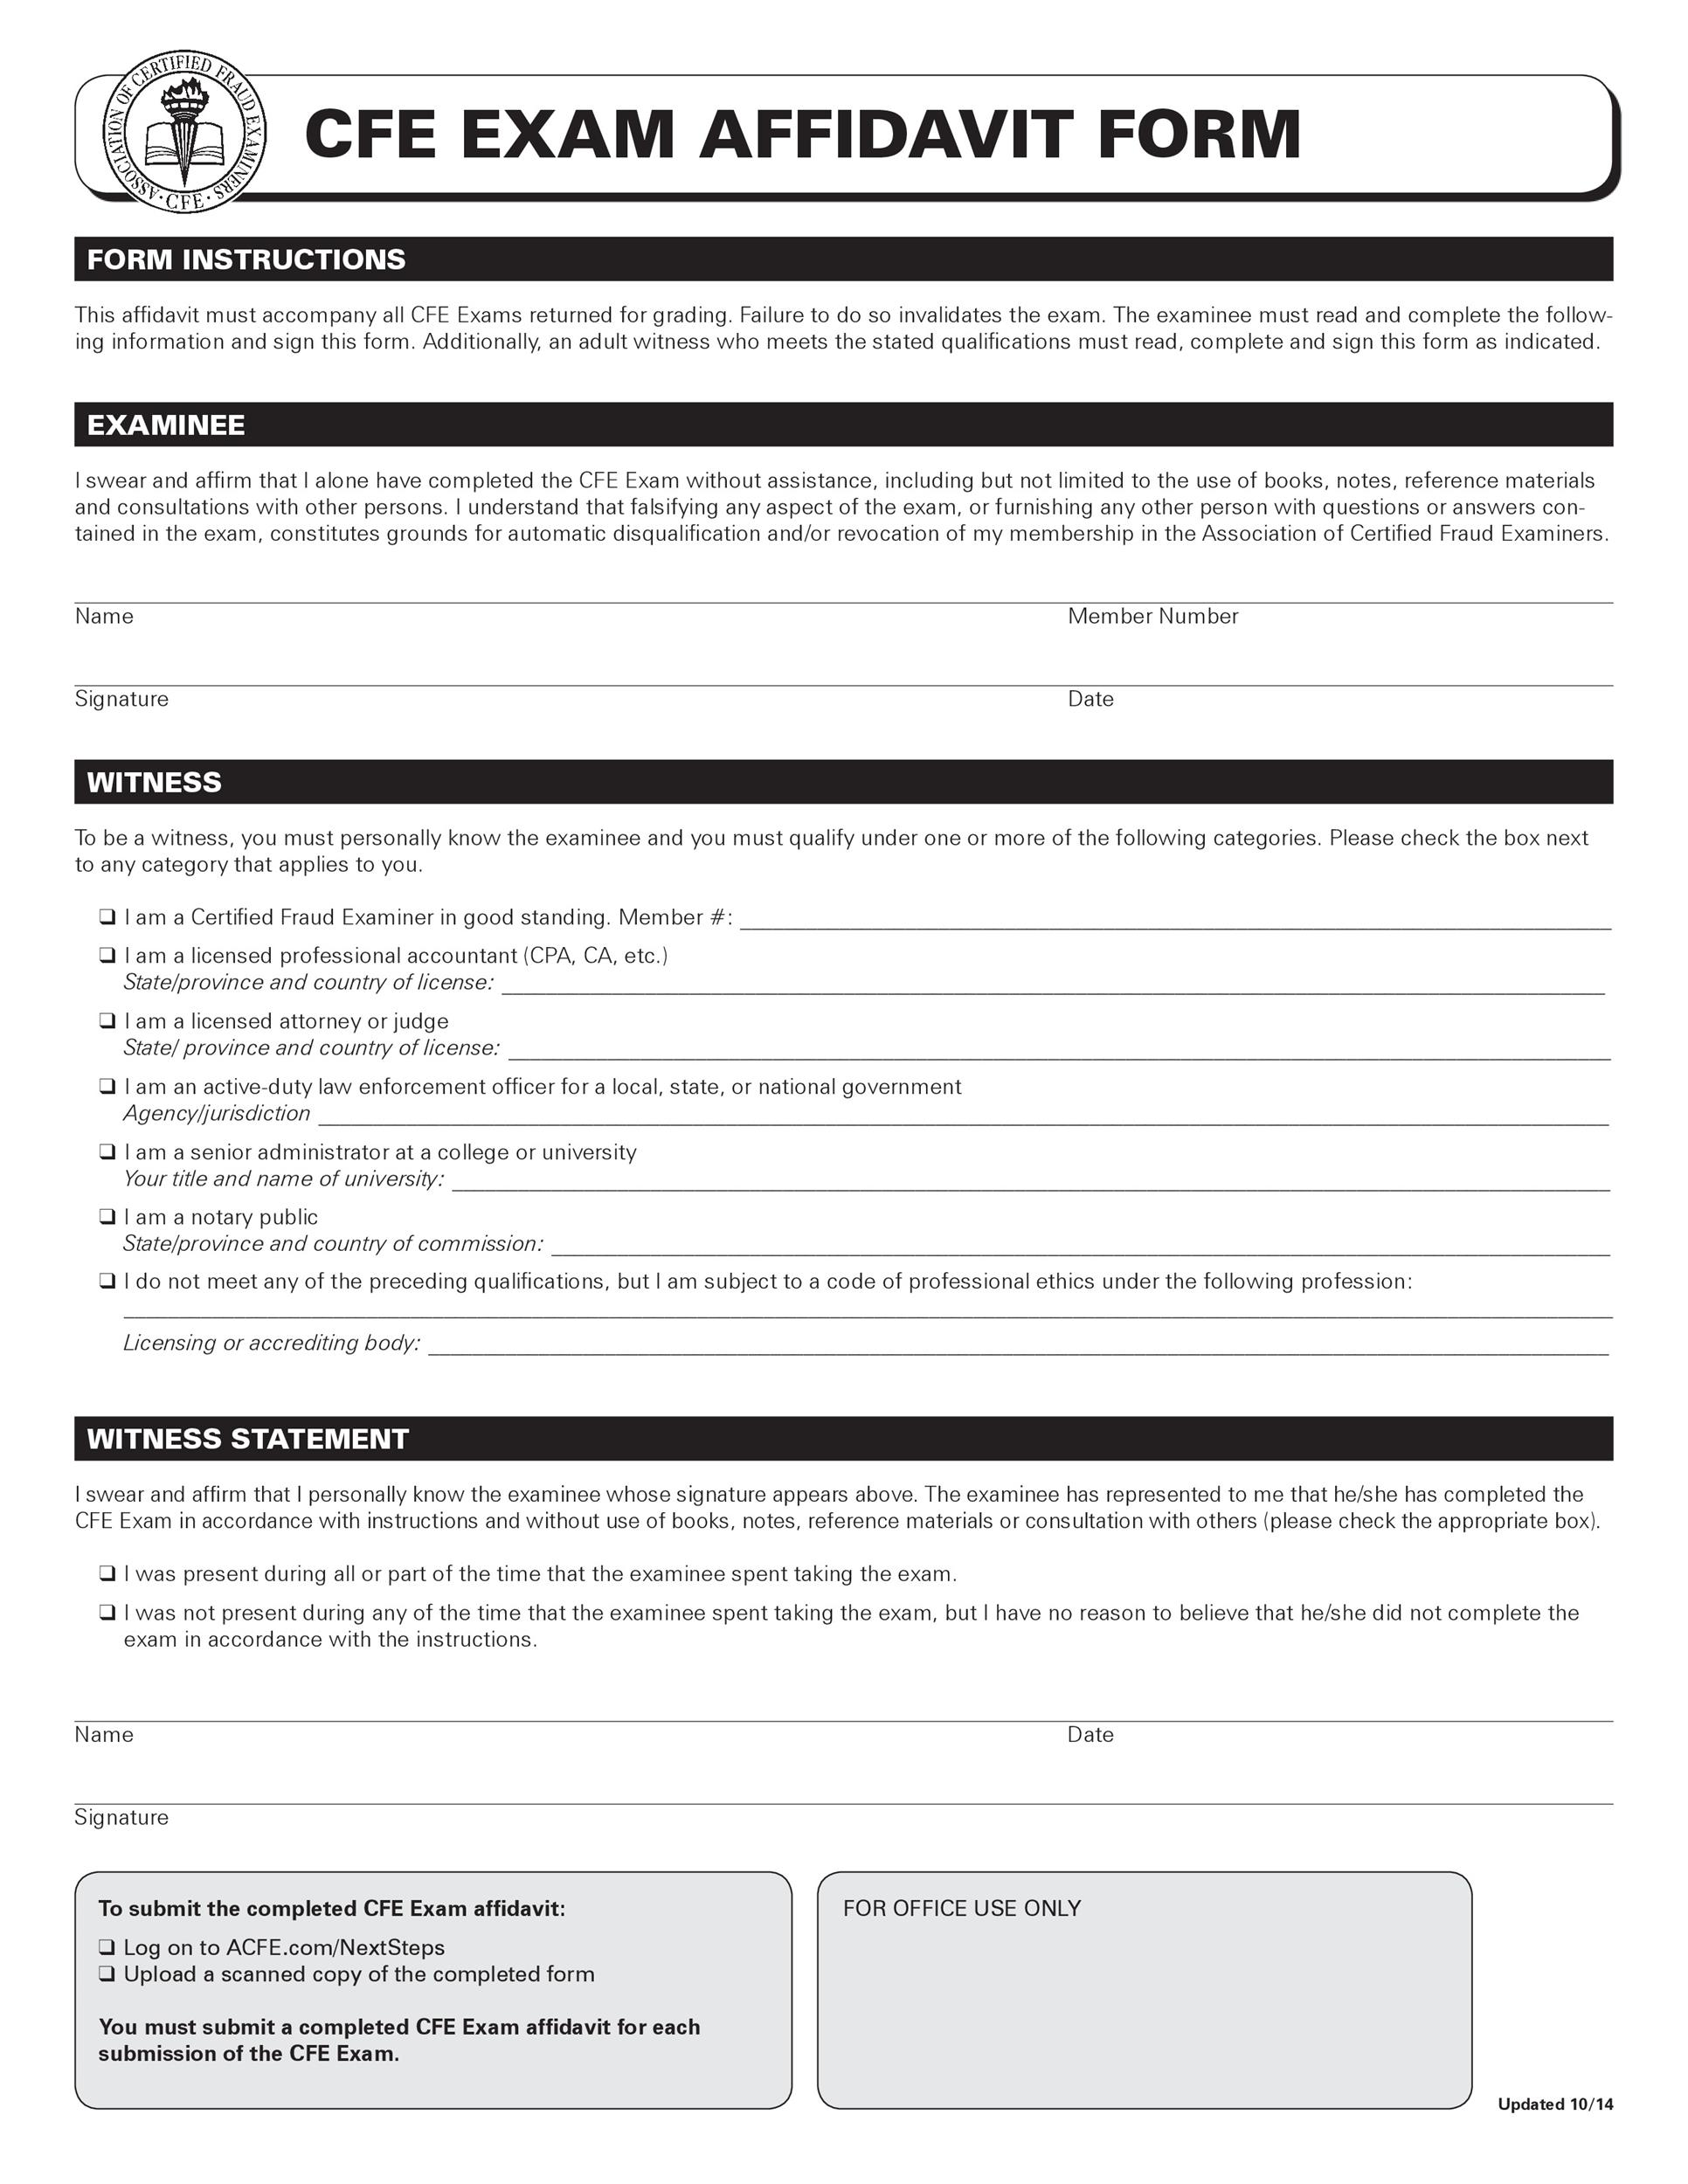 affidavit form 26